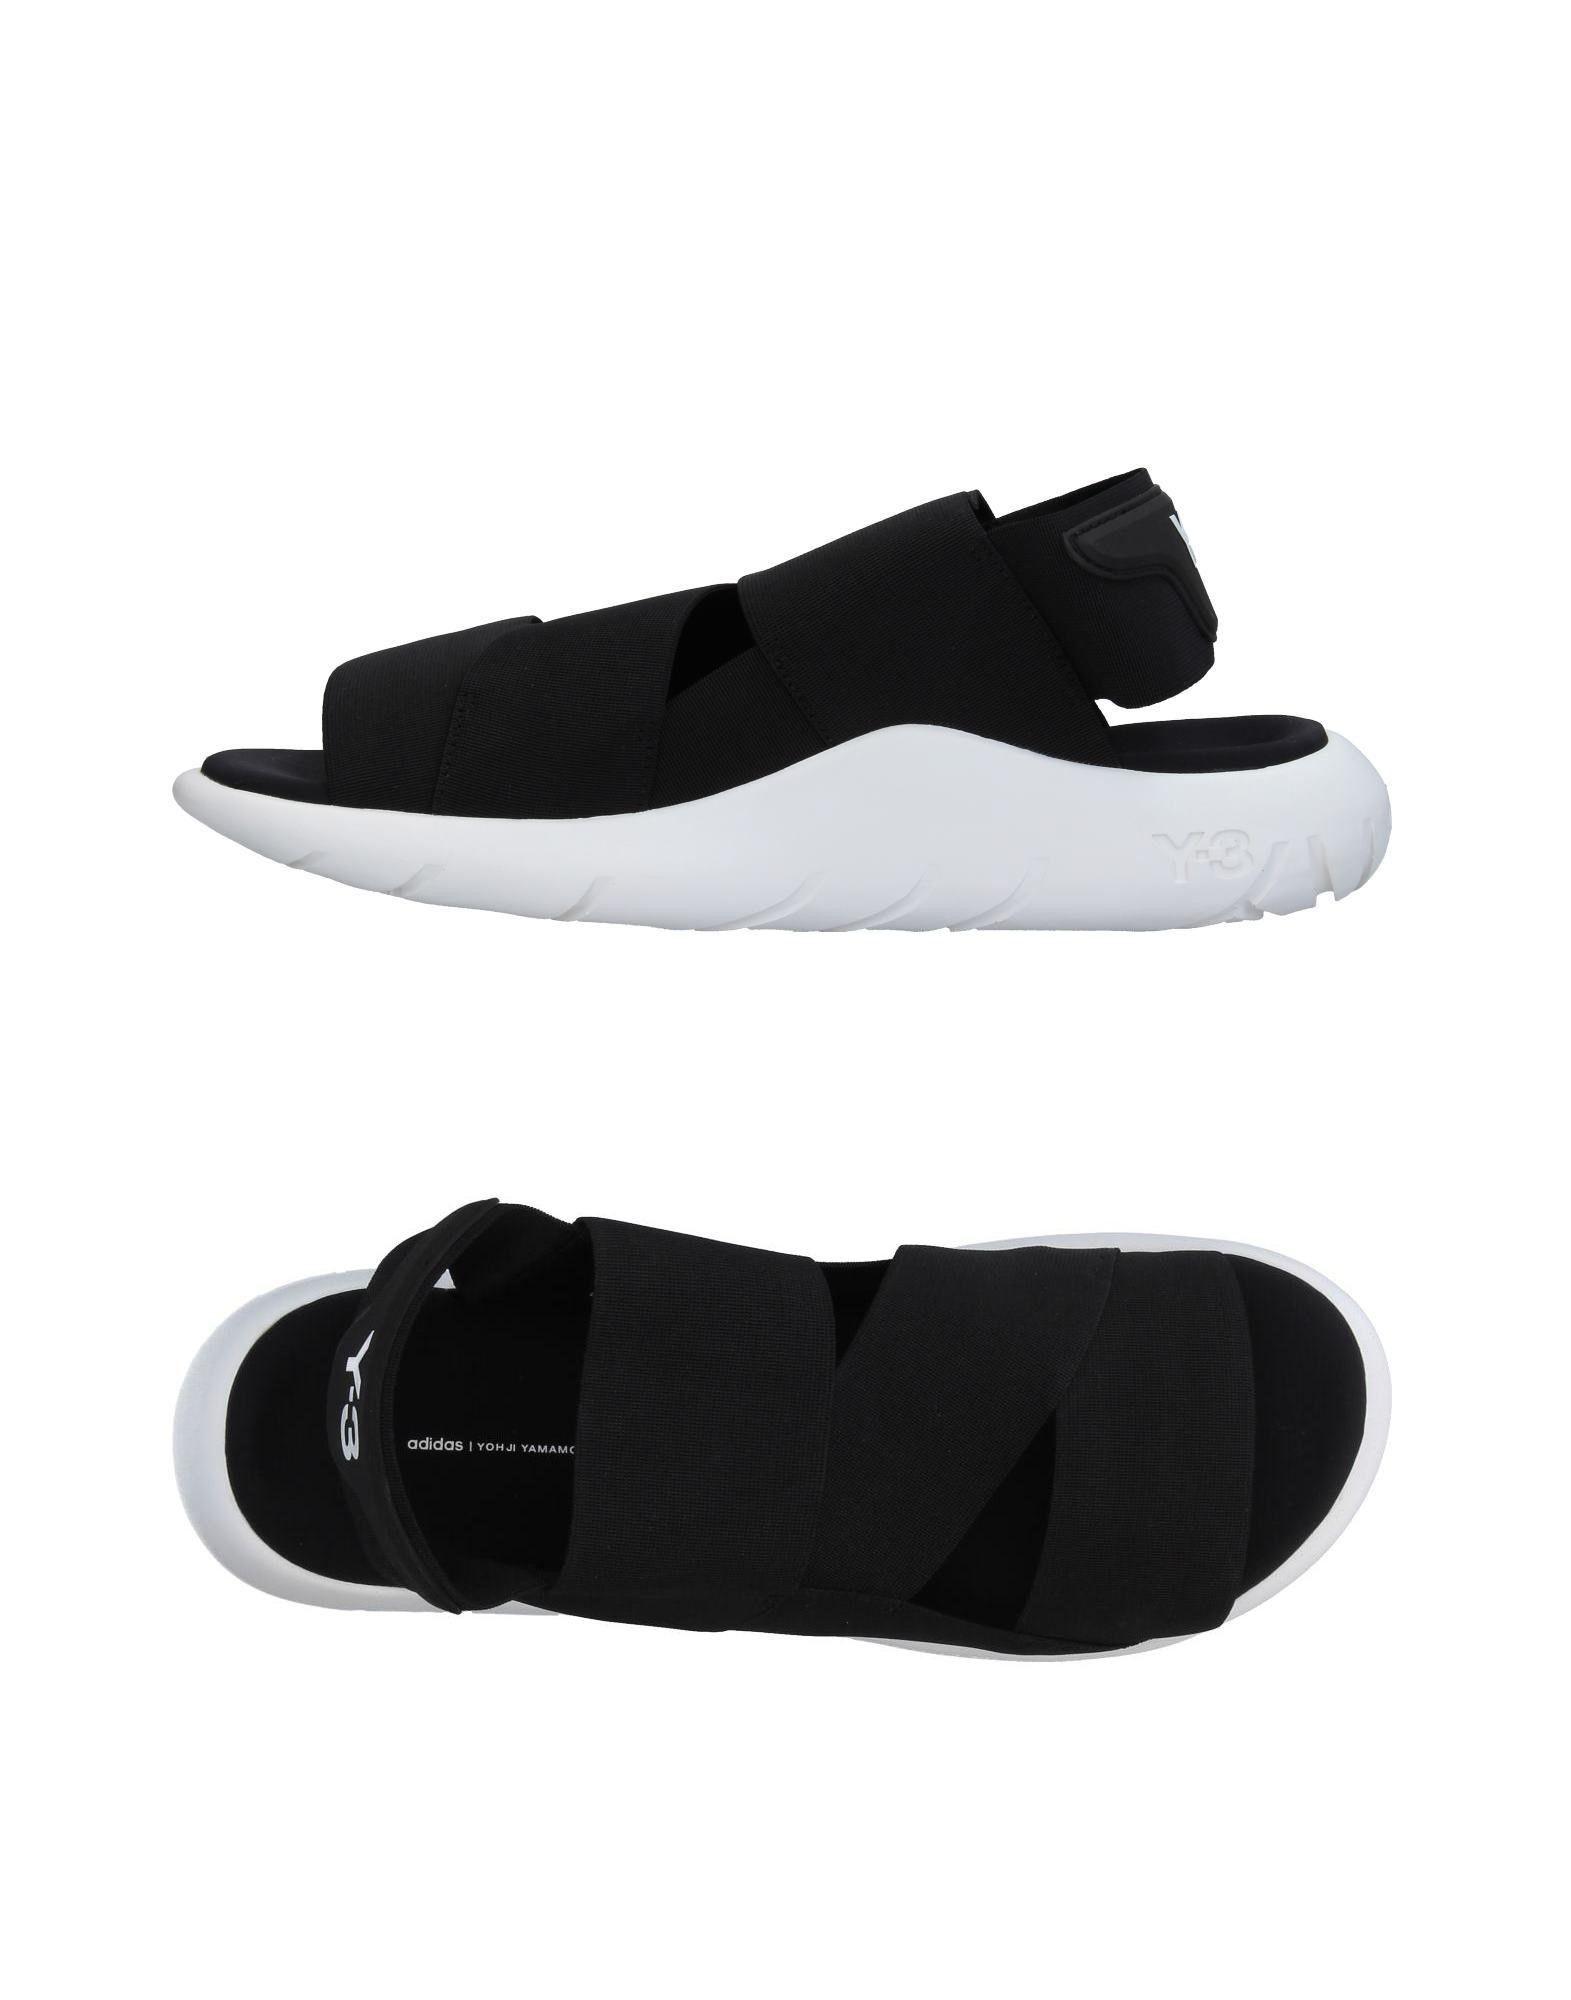 fd78837c7f9f Y-3 SANDALS.  y-3  shoes